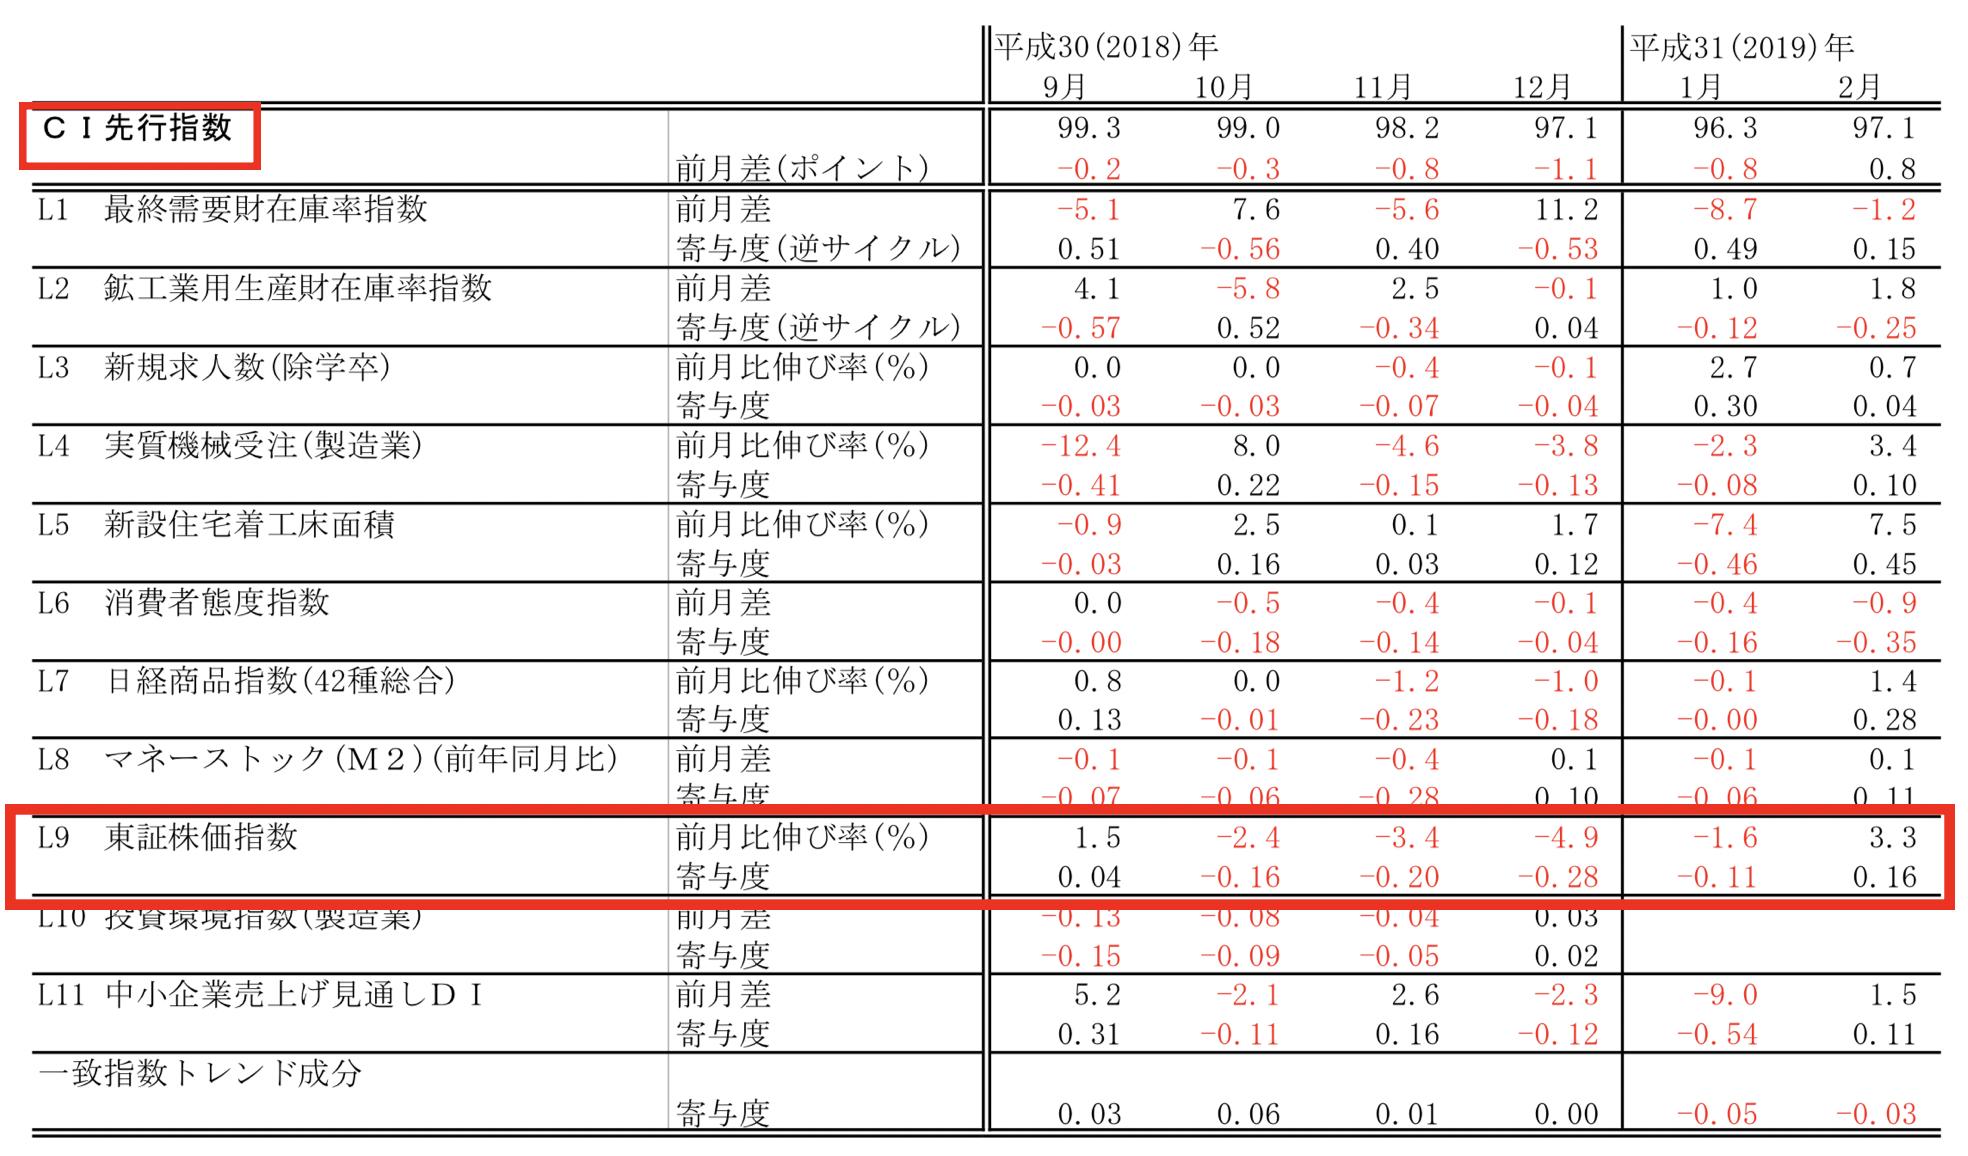 株は景気先行指数